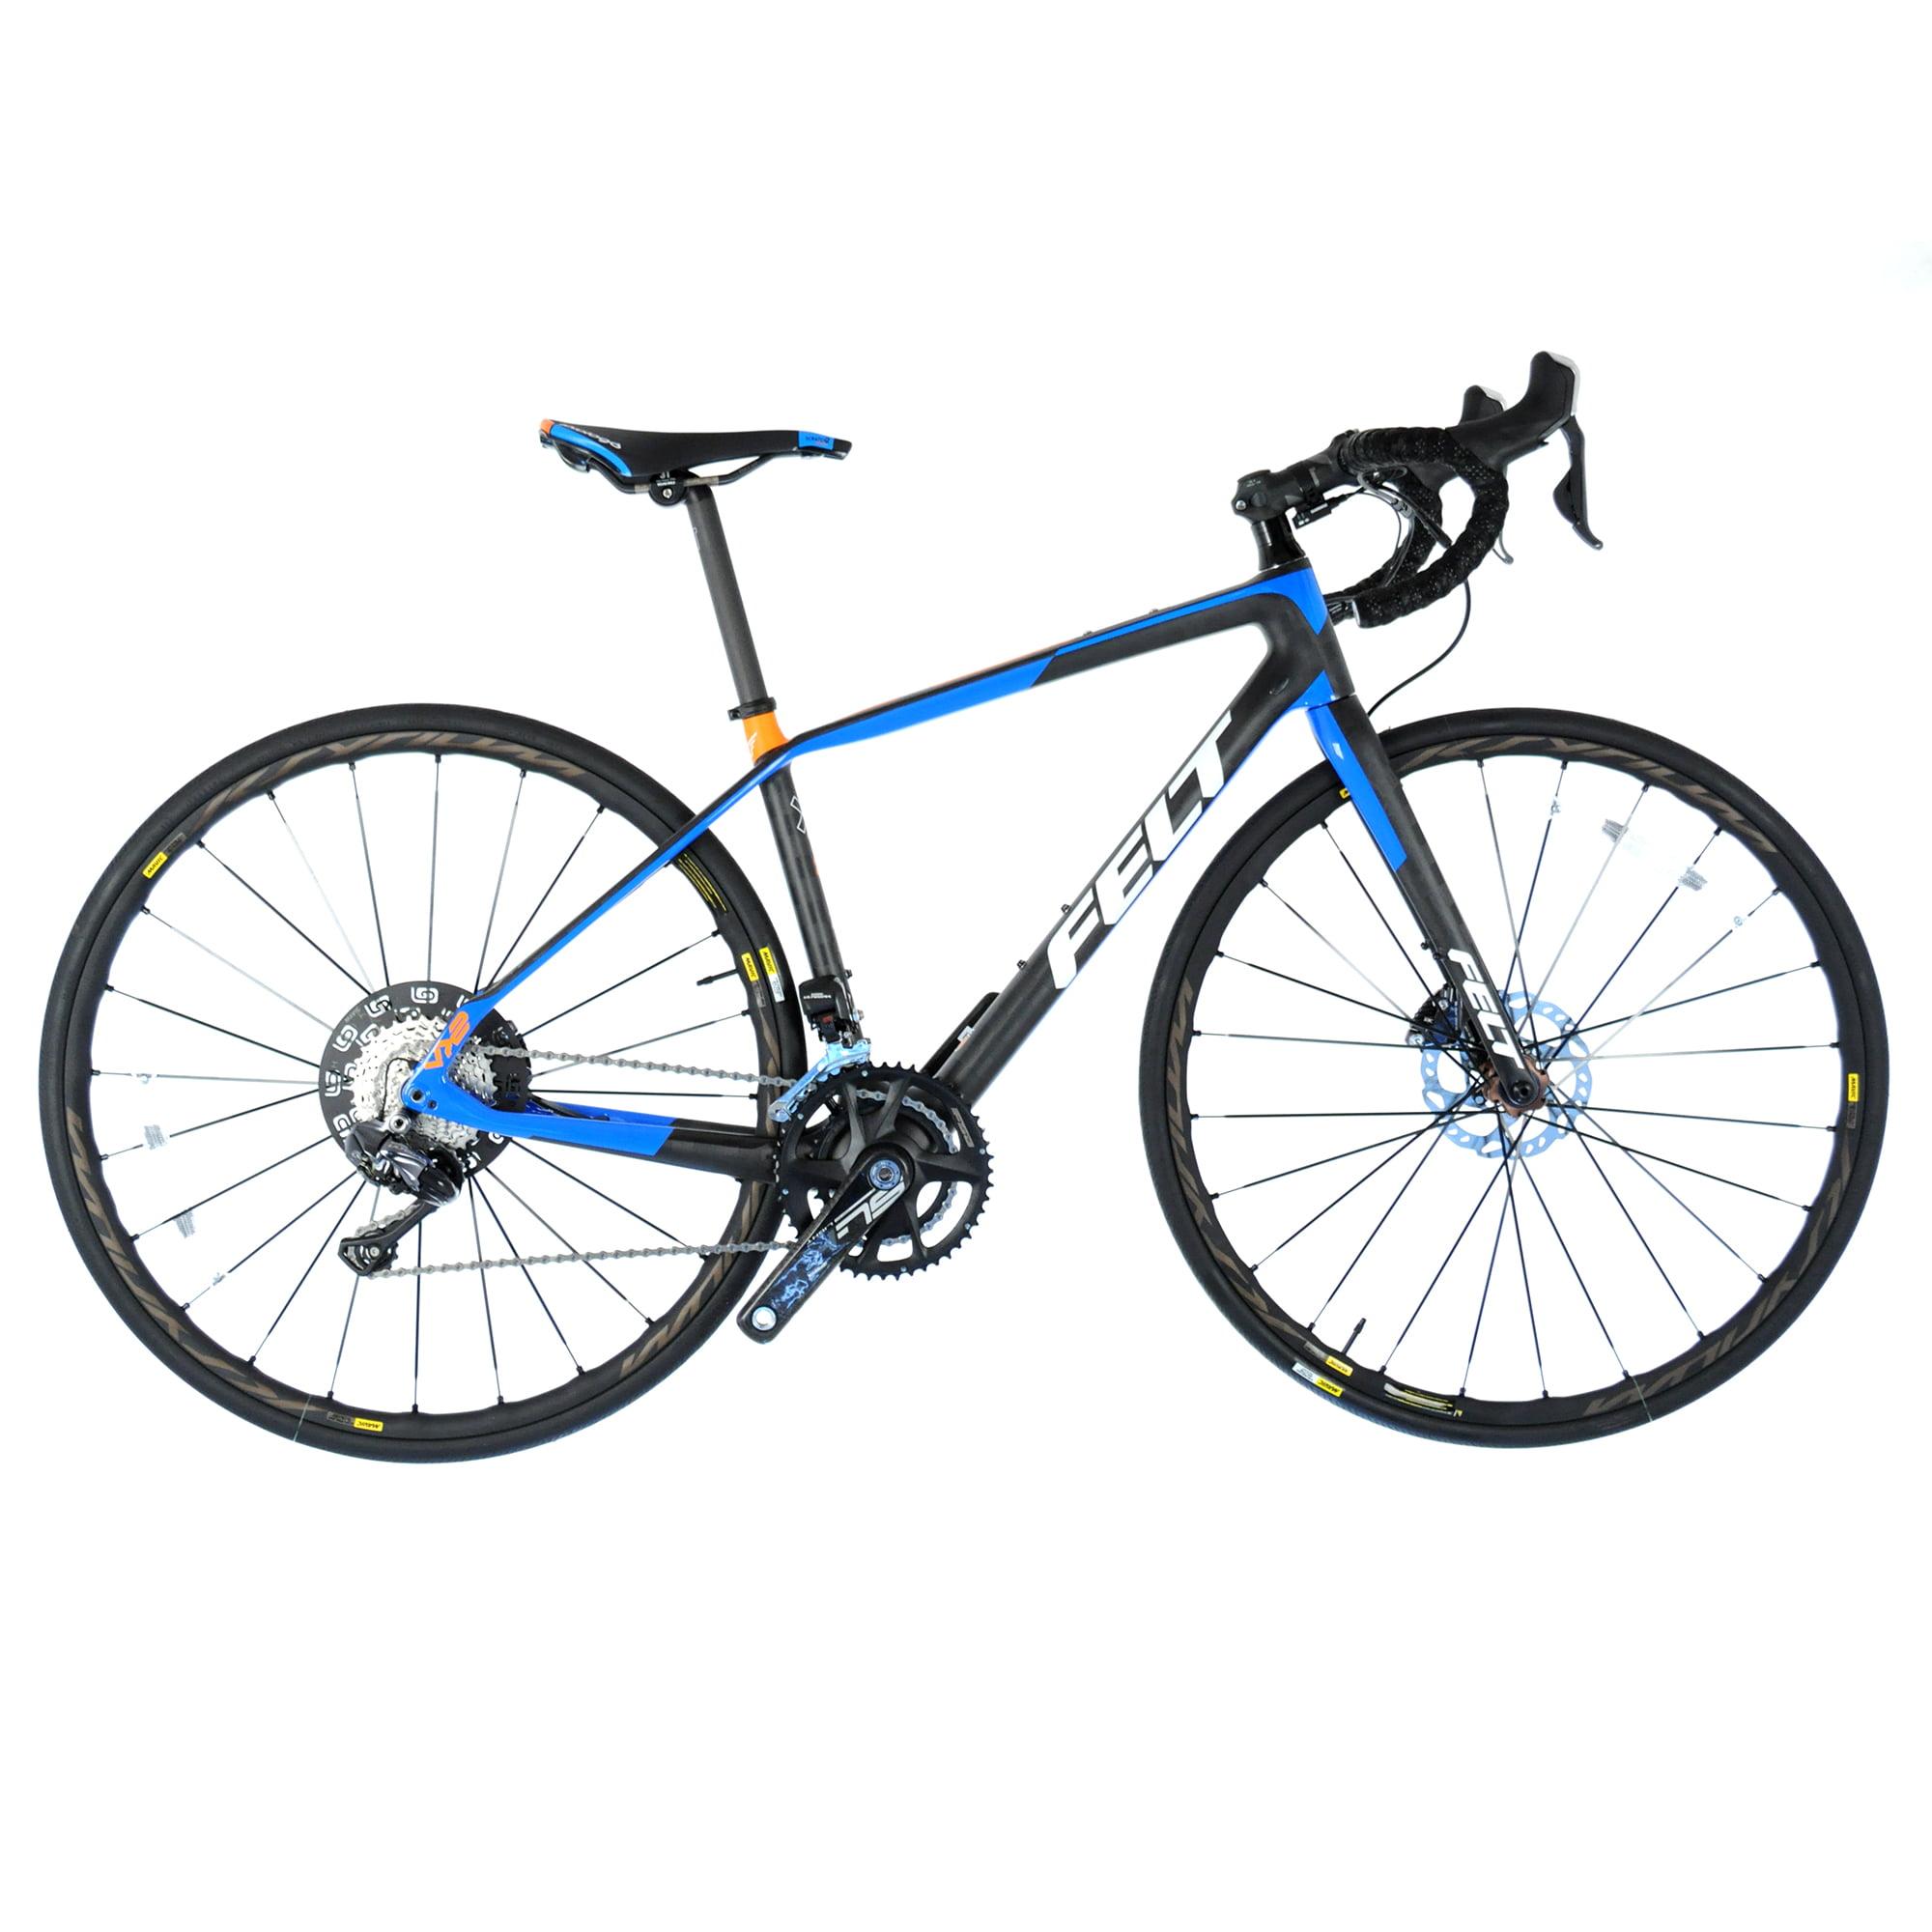 Felt VR2 Carbon Hydraulic Disc Road Bike Shimano Ultegra Di2 2x11-Speed // 47cm